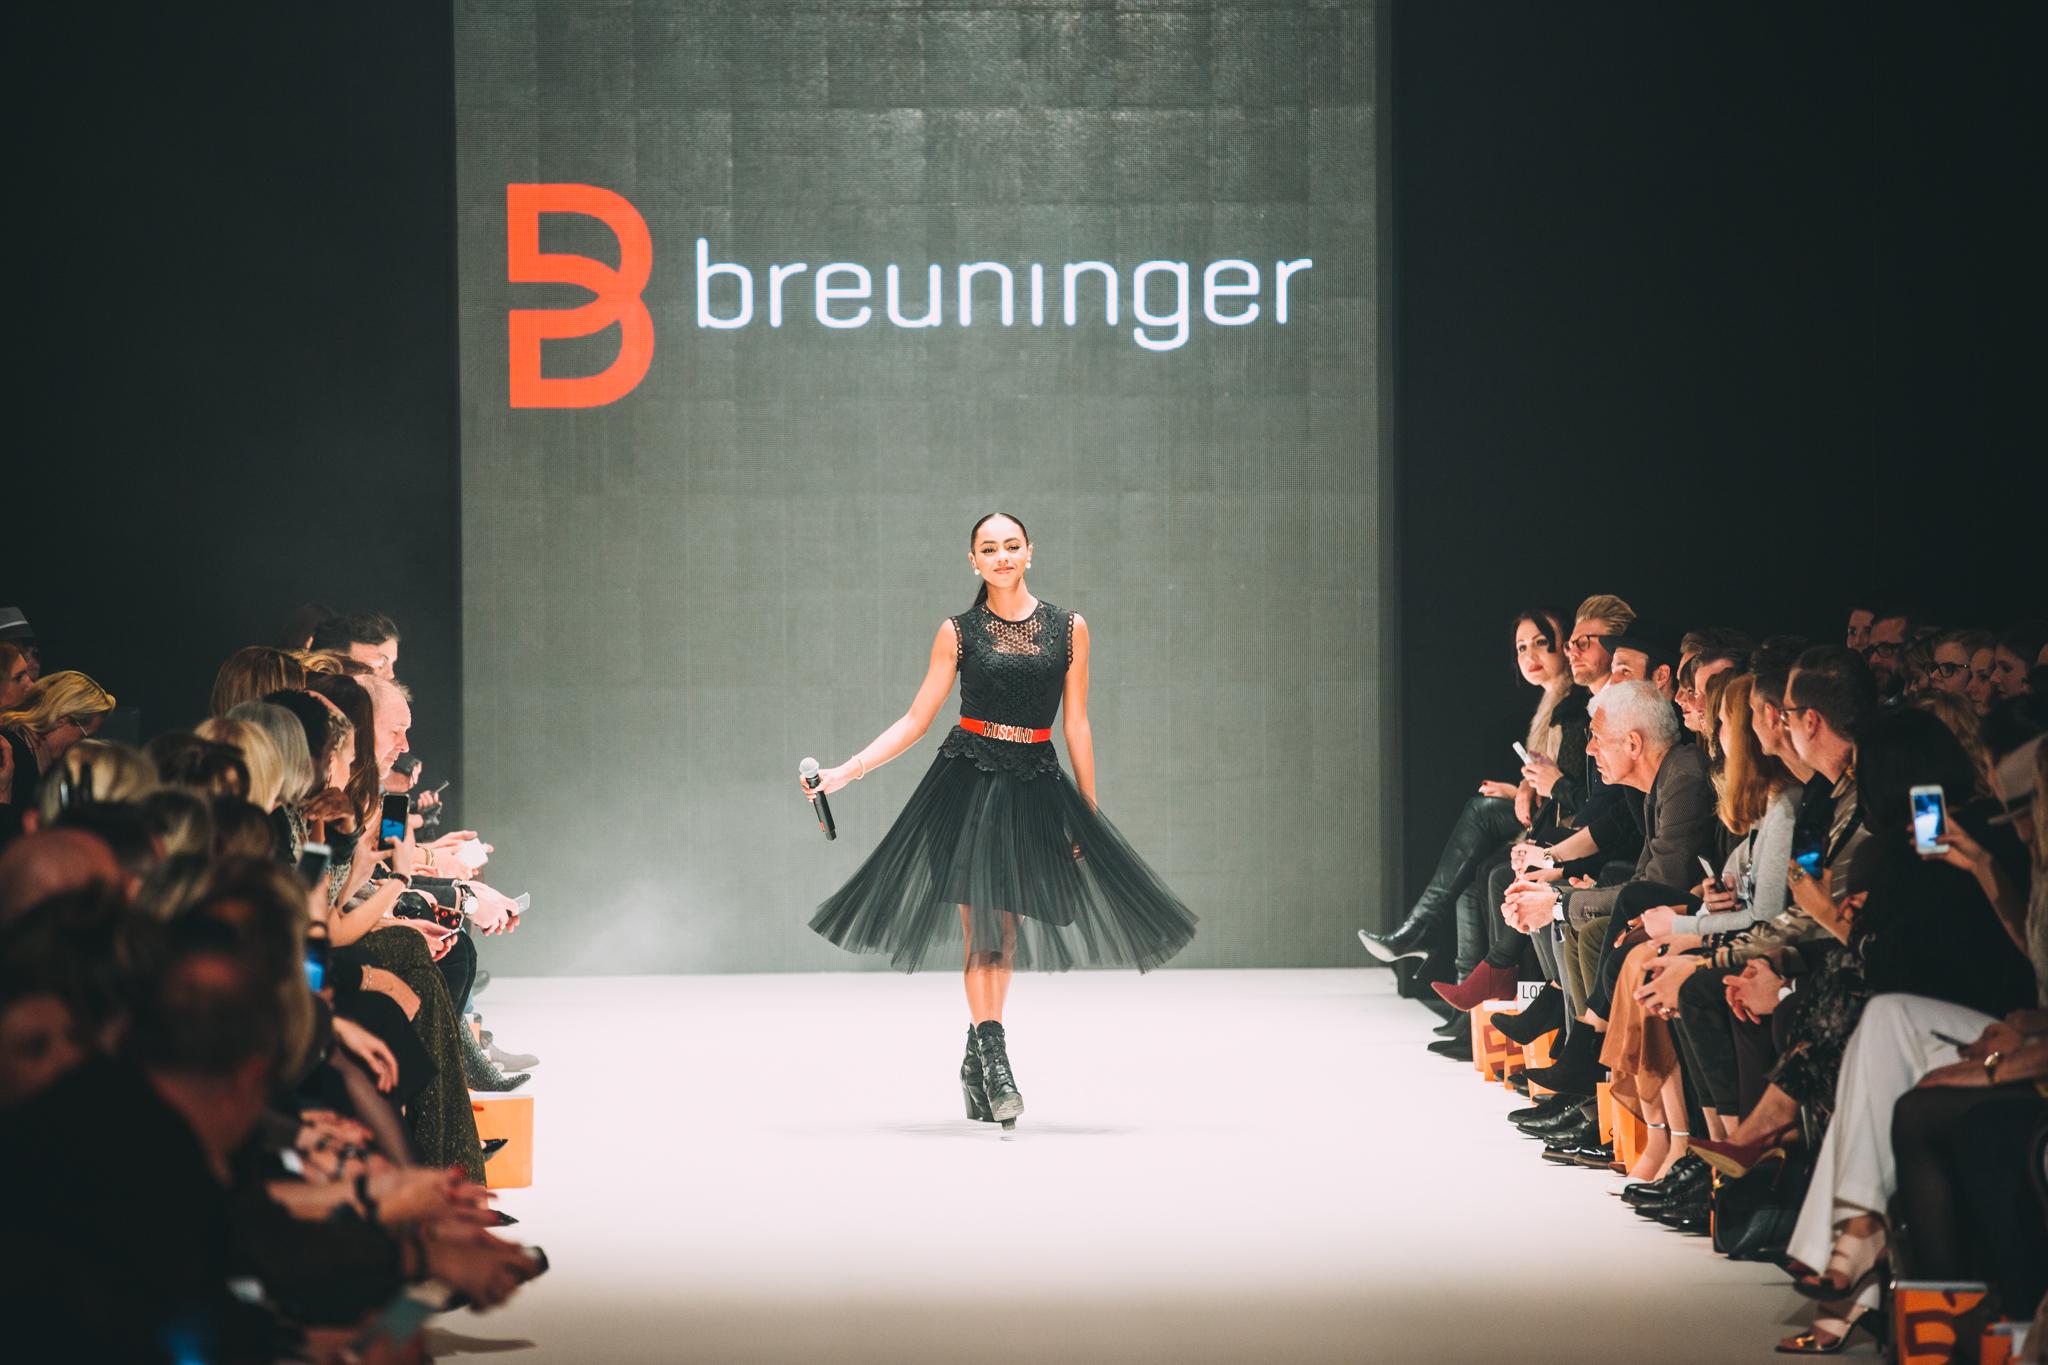 breuninger – Social Media Videoproduktion und Event-Fotografie